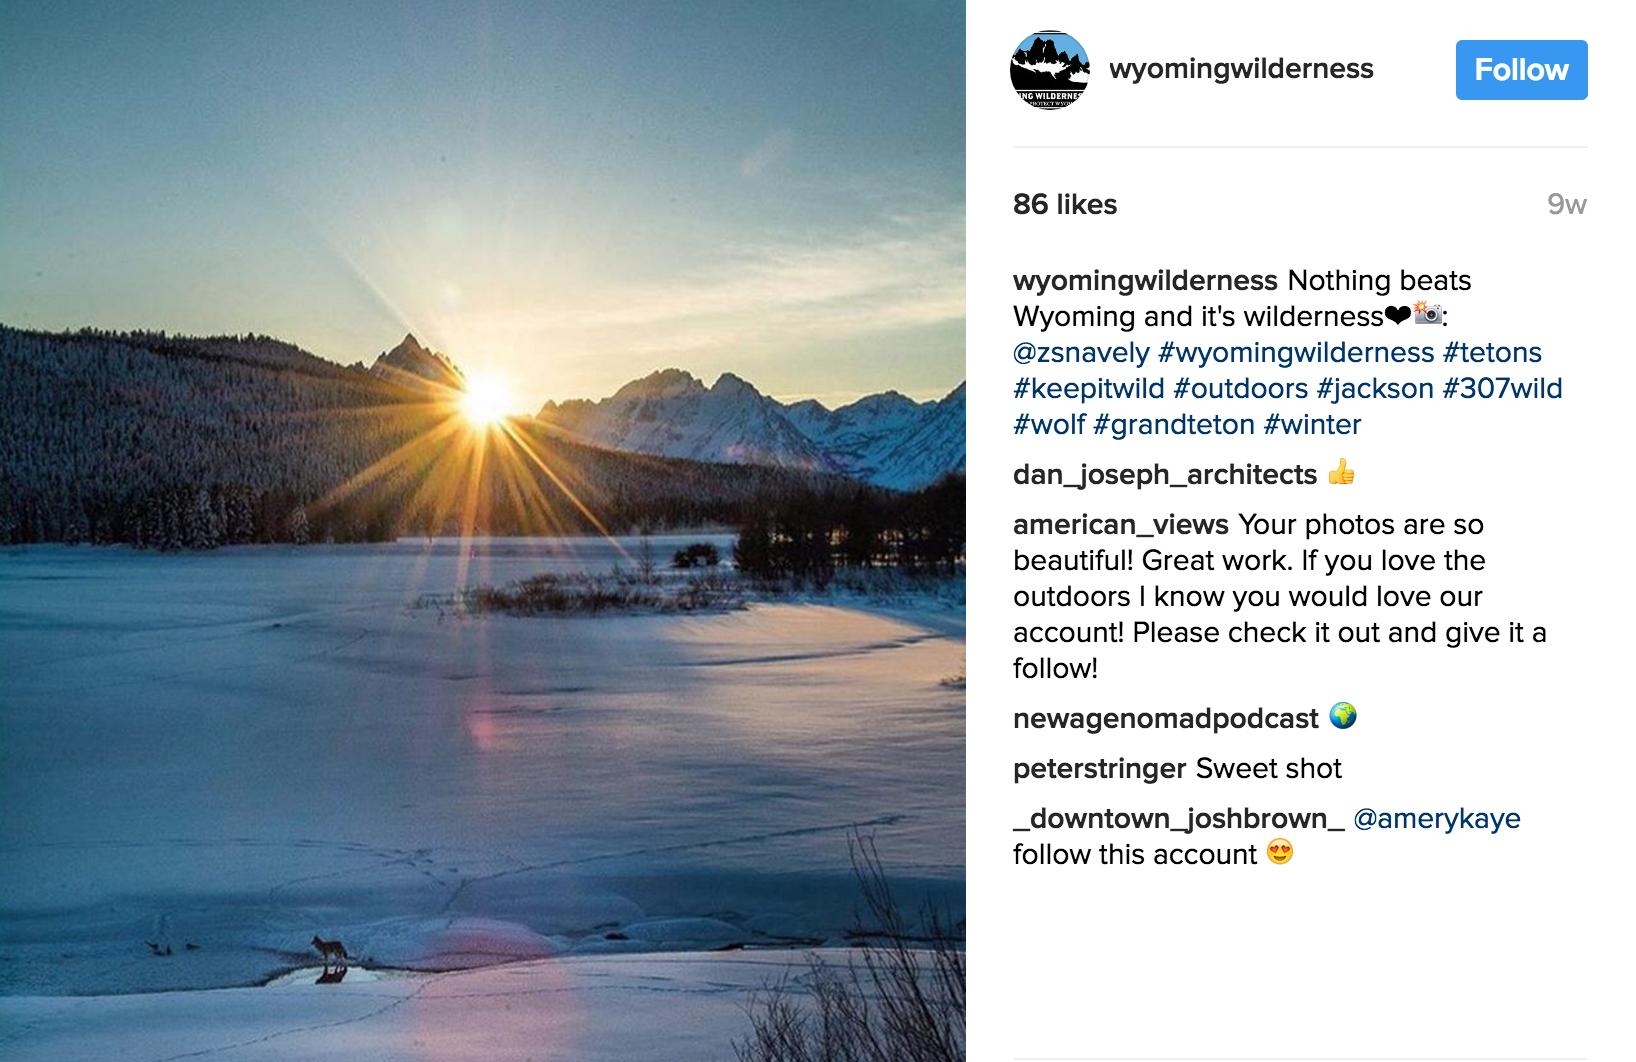 Wyoming Wilderness Association Instagram Feed, February 2017